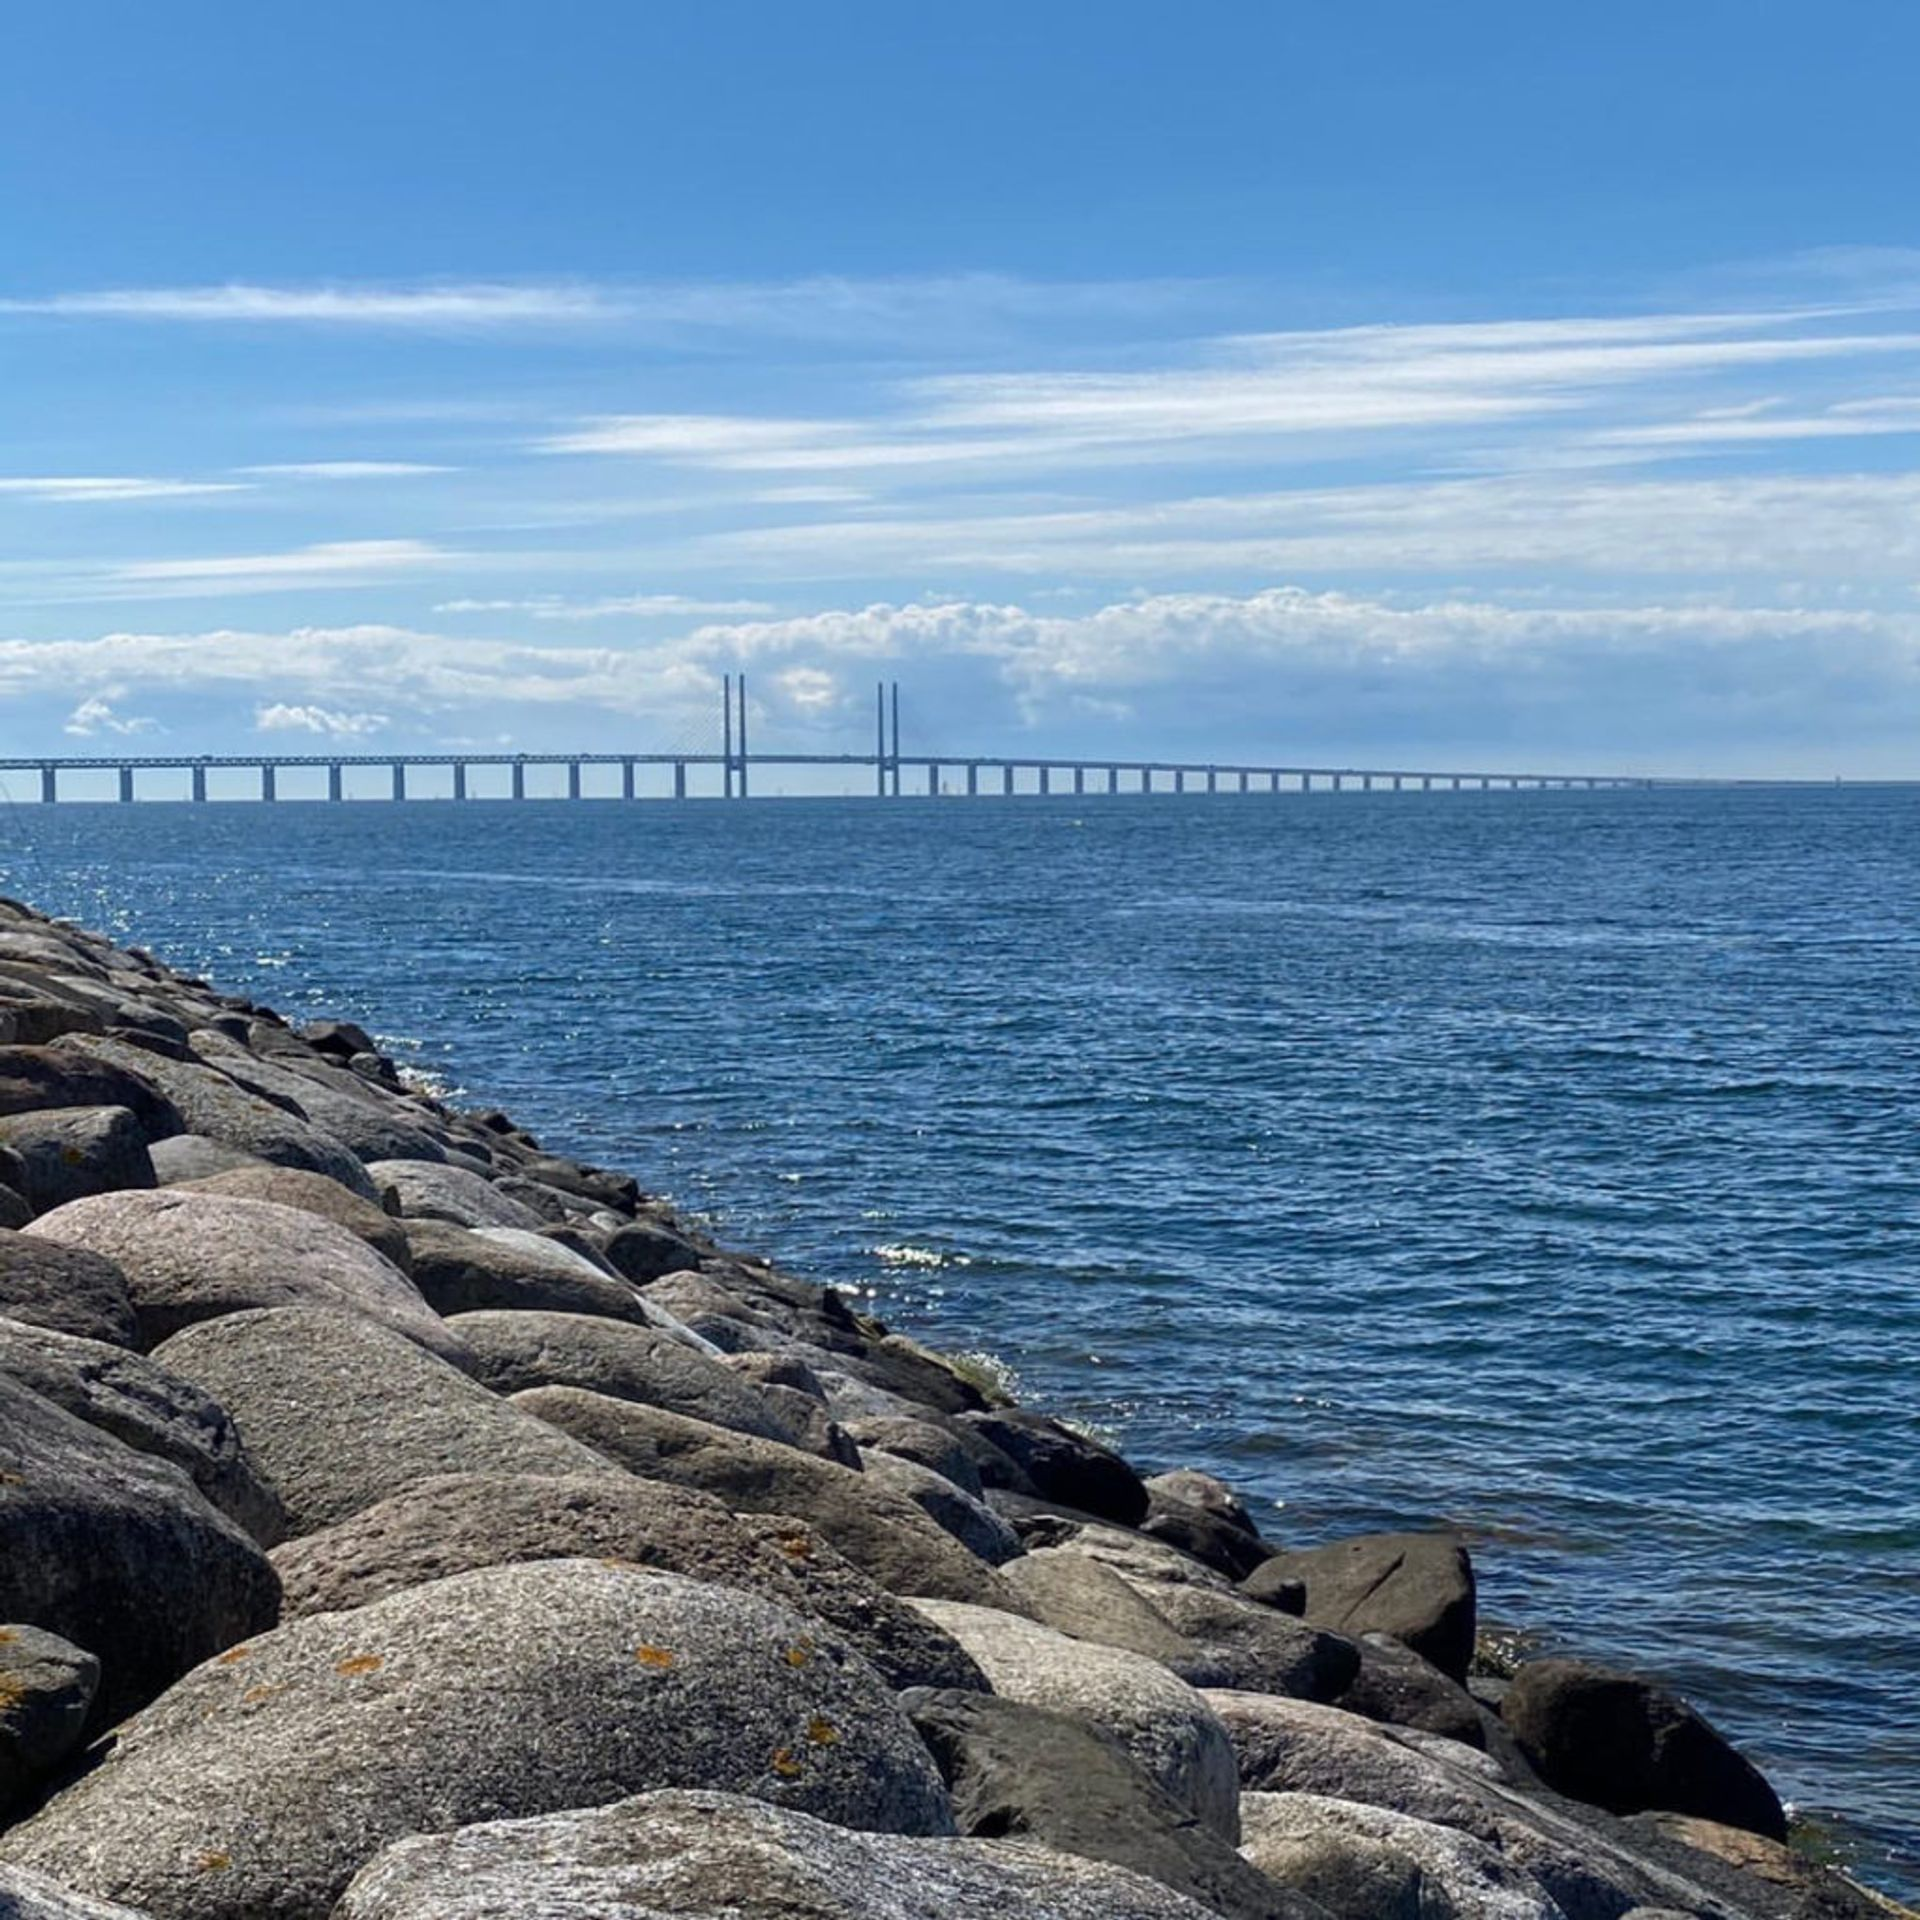 The Öresund bridge on a sunny day.